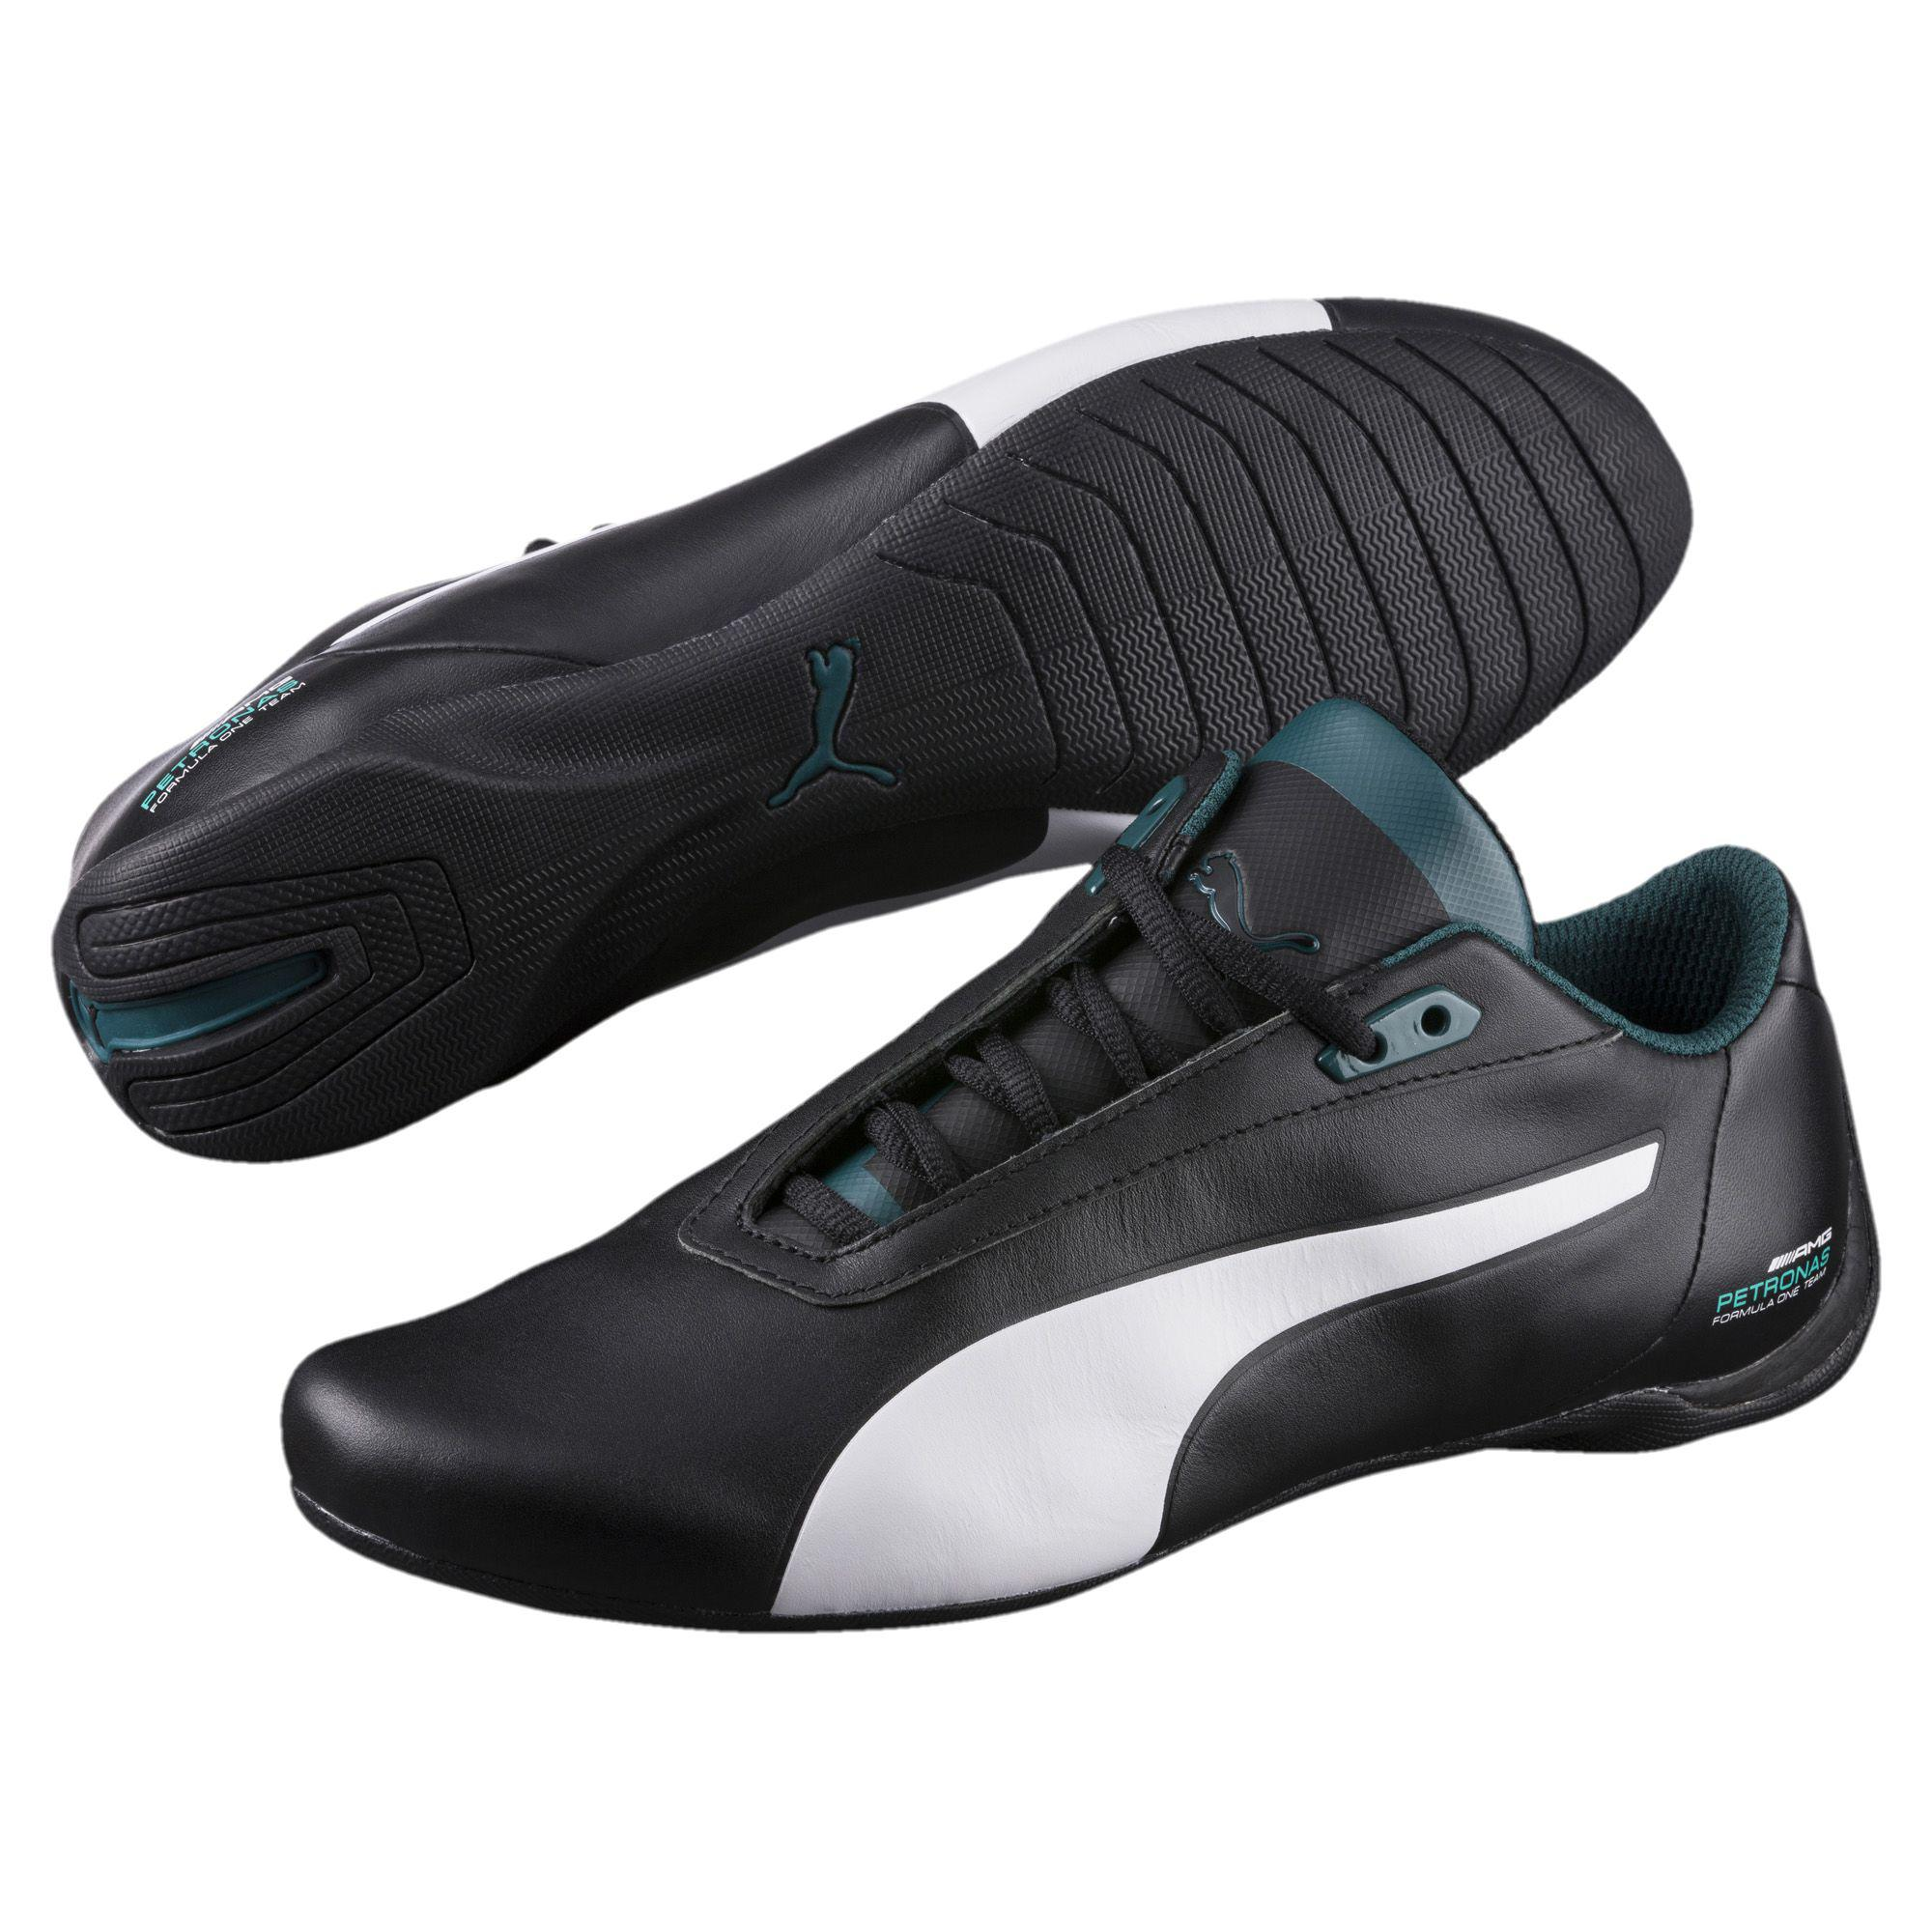 a971bcc1f0e8ad Lyst - PUMA Mercedes Future Cat Men s Shoes in Black for Men